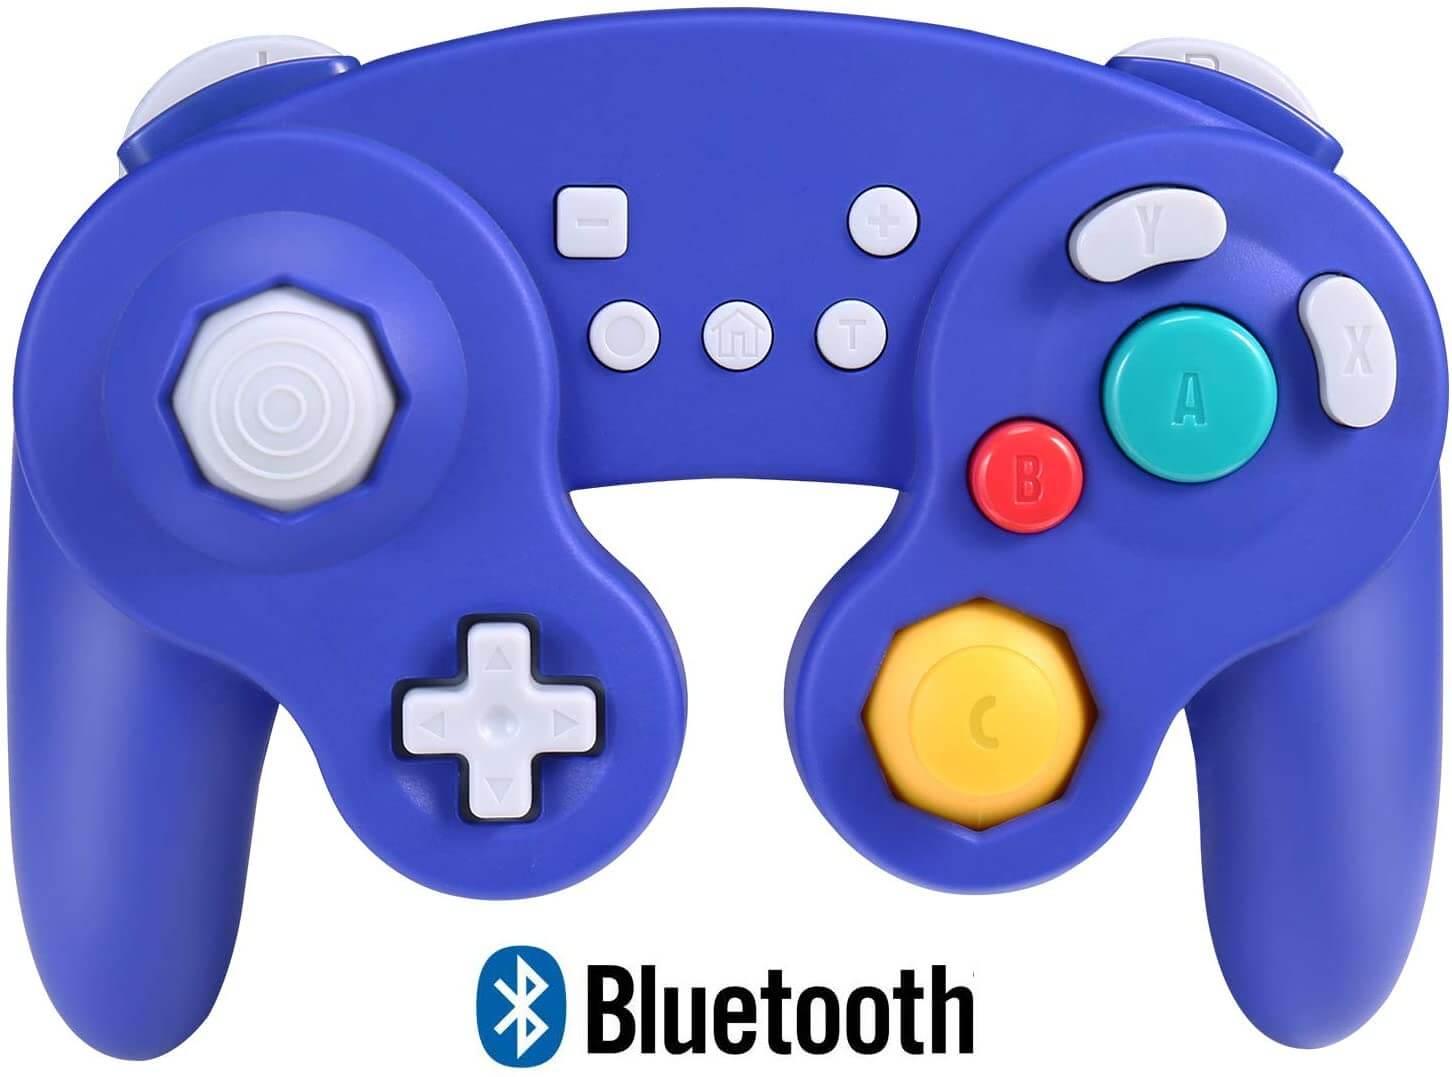 Exlene Wireless GameCube Controller